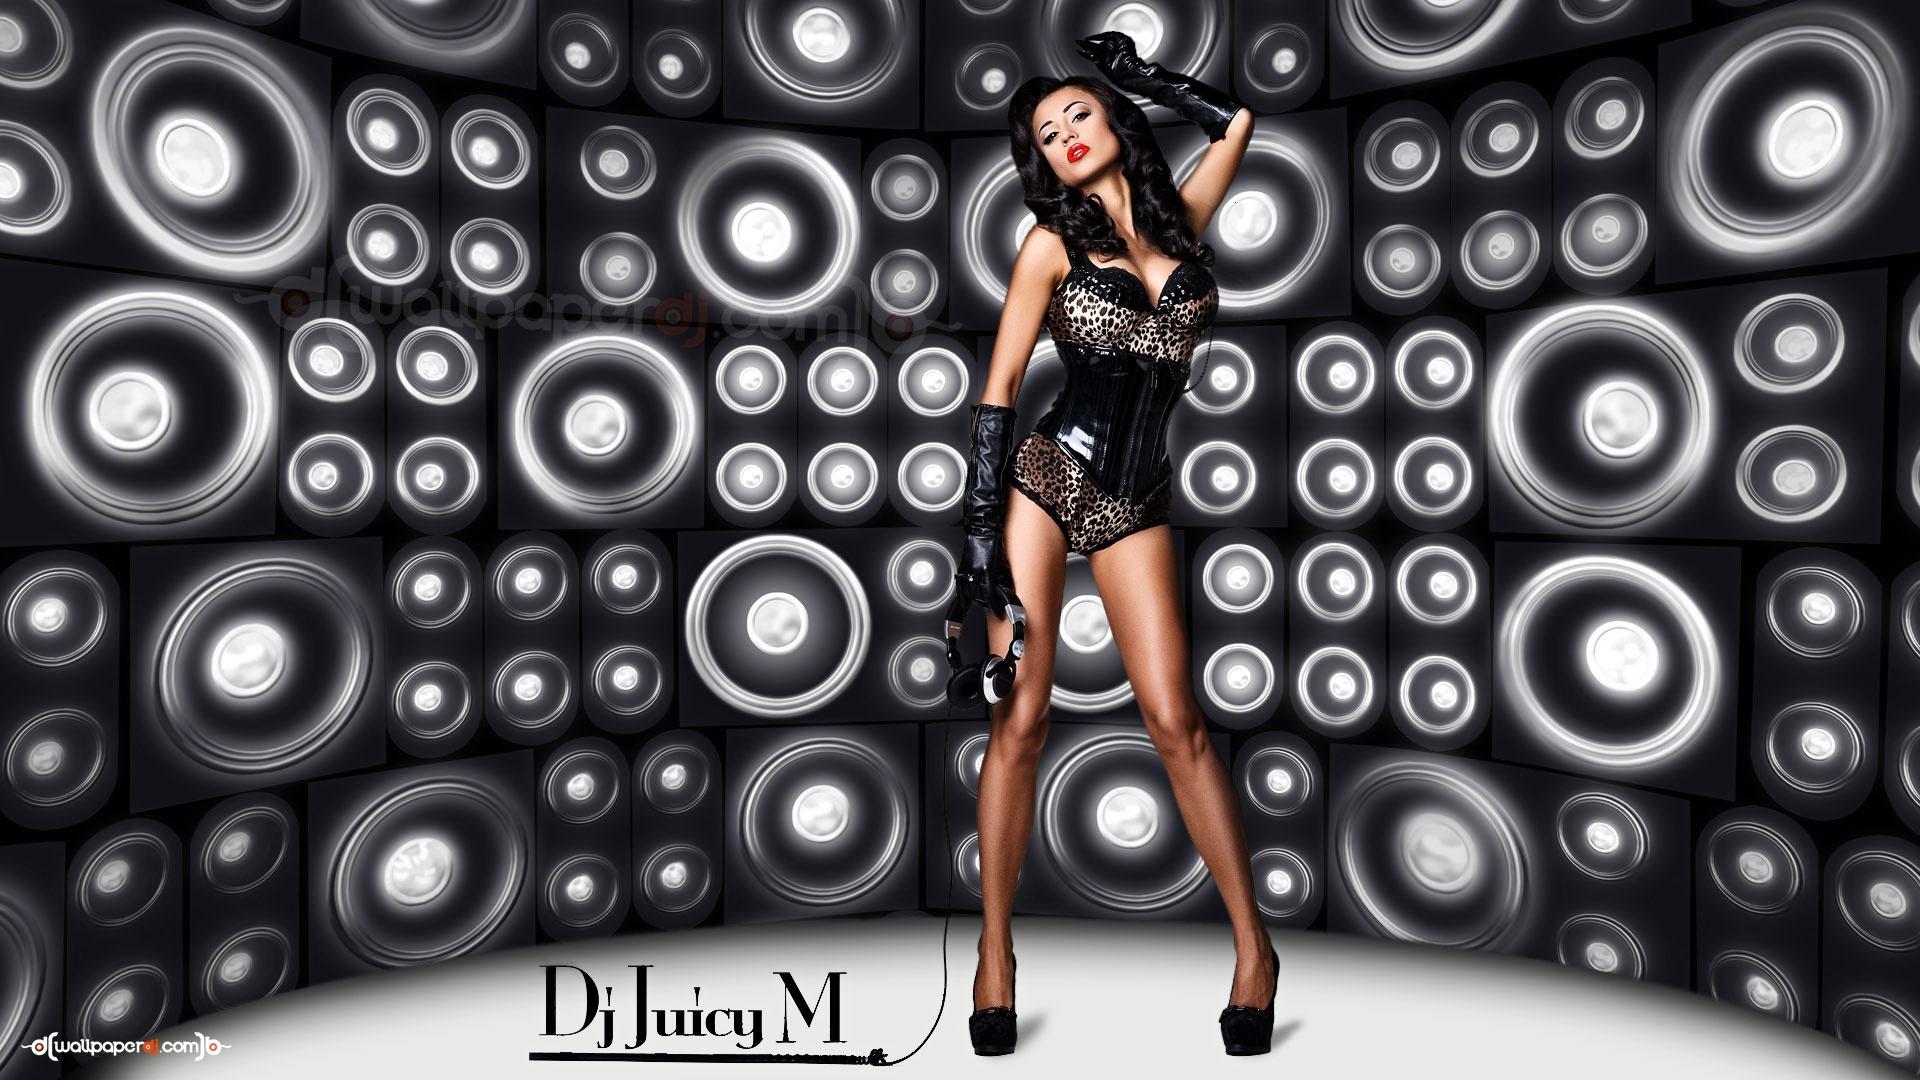 1920x1080 Dj Juicy M Wallpaper Music And Dance Wallpapers